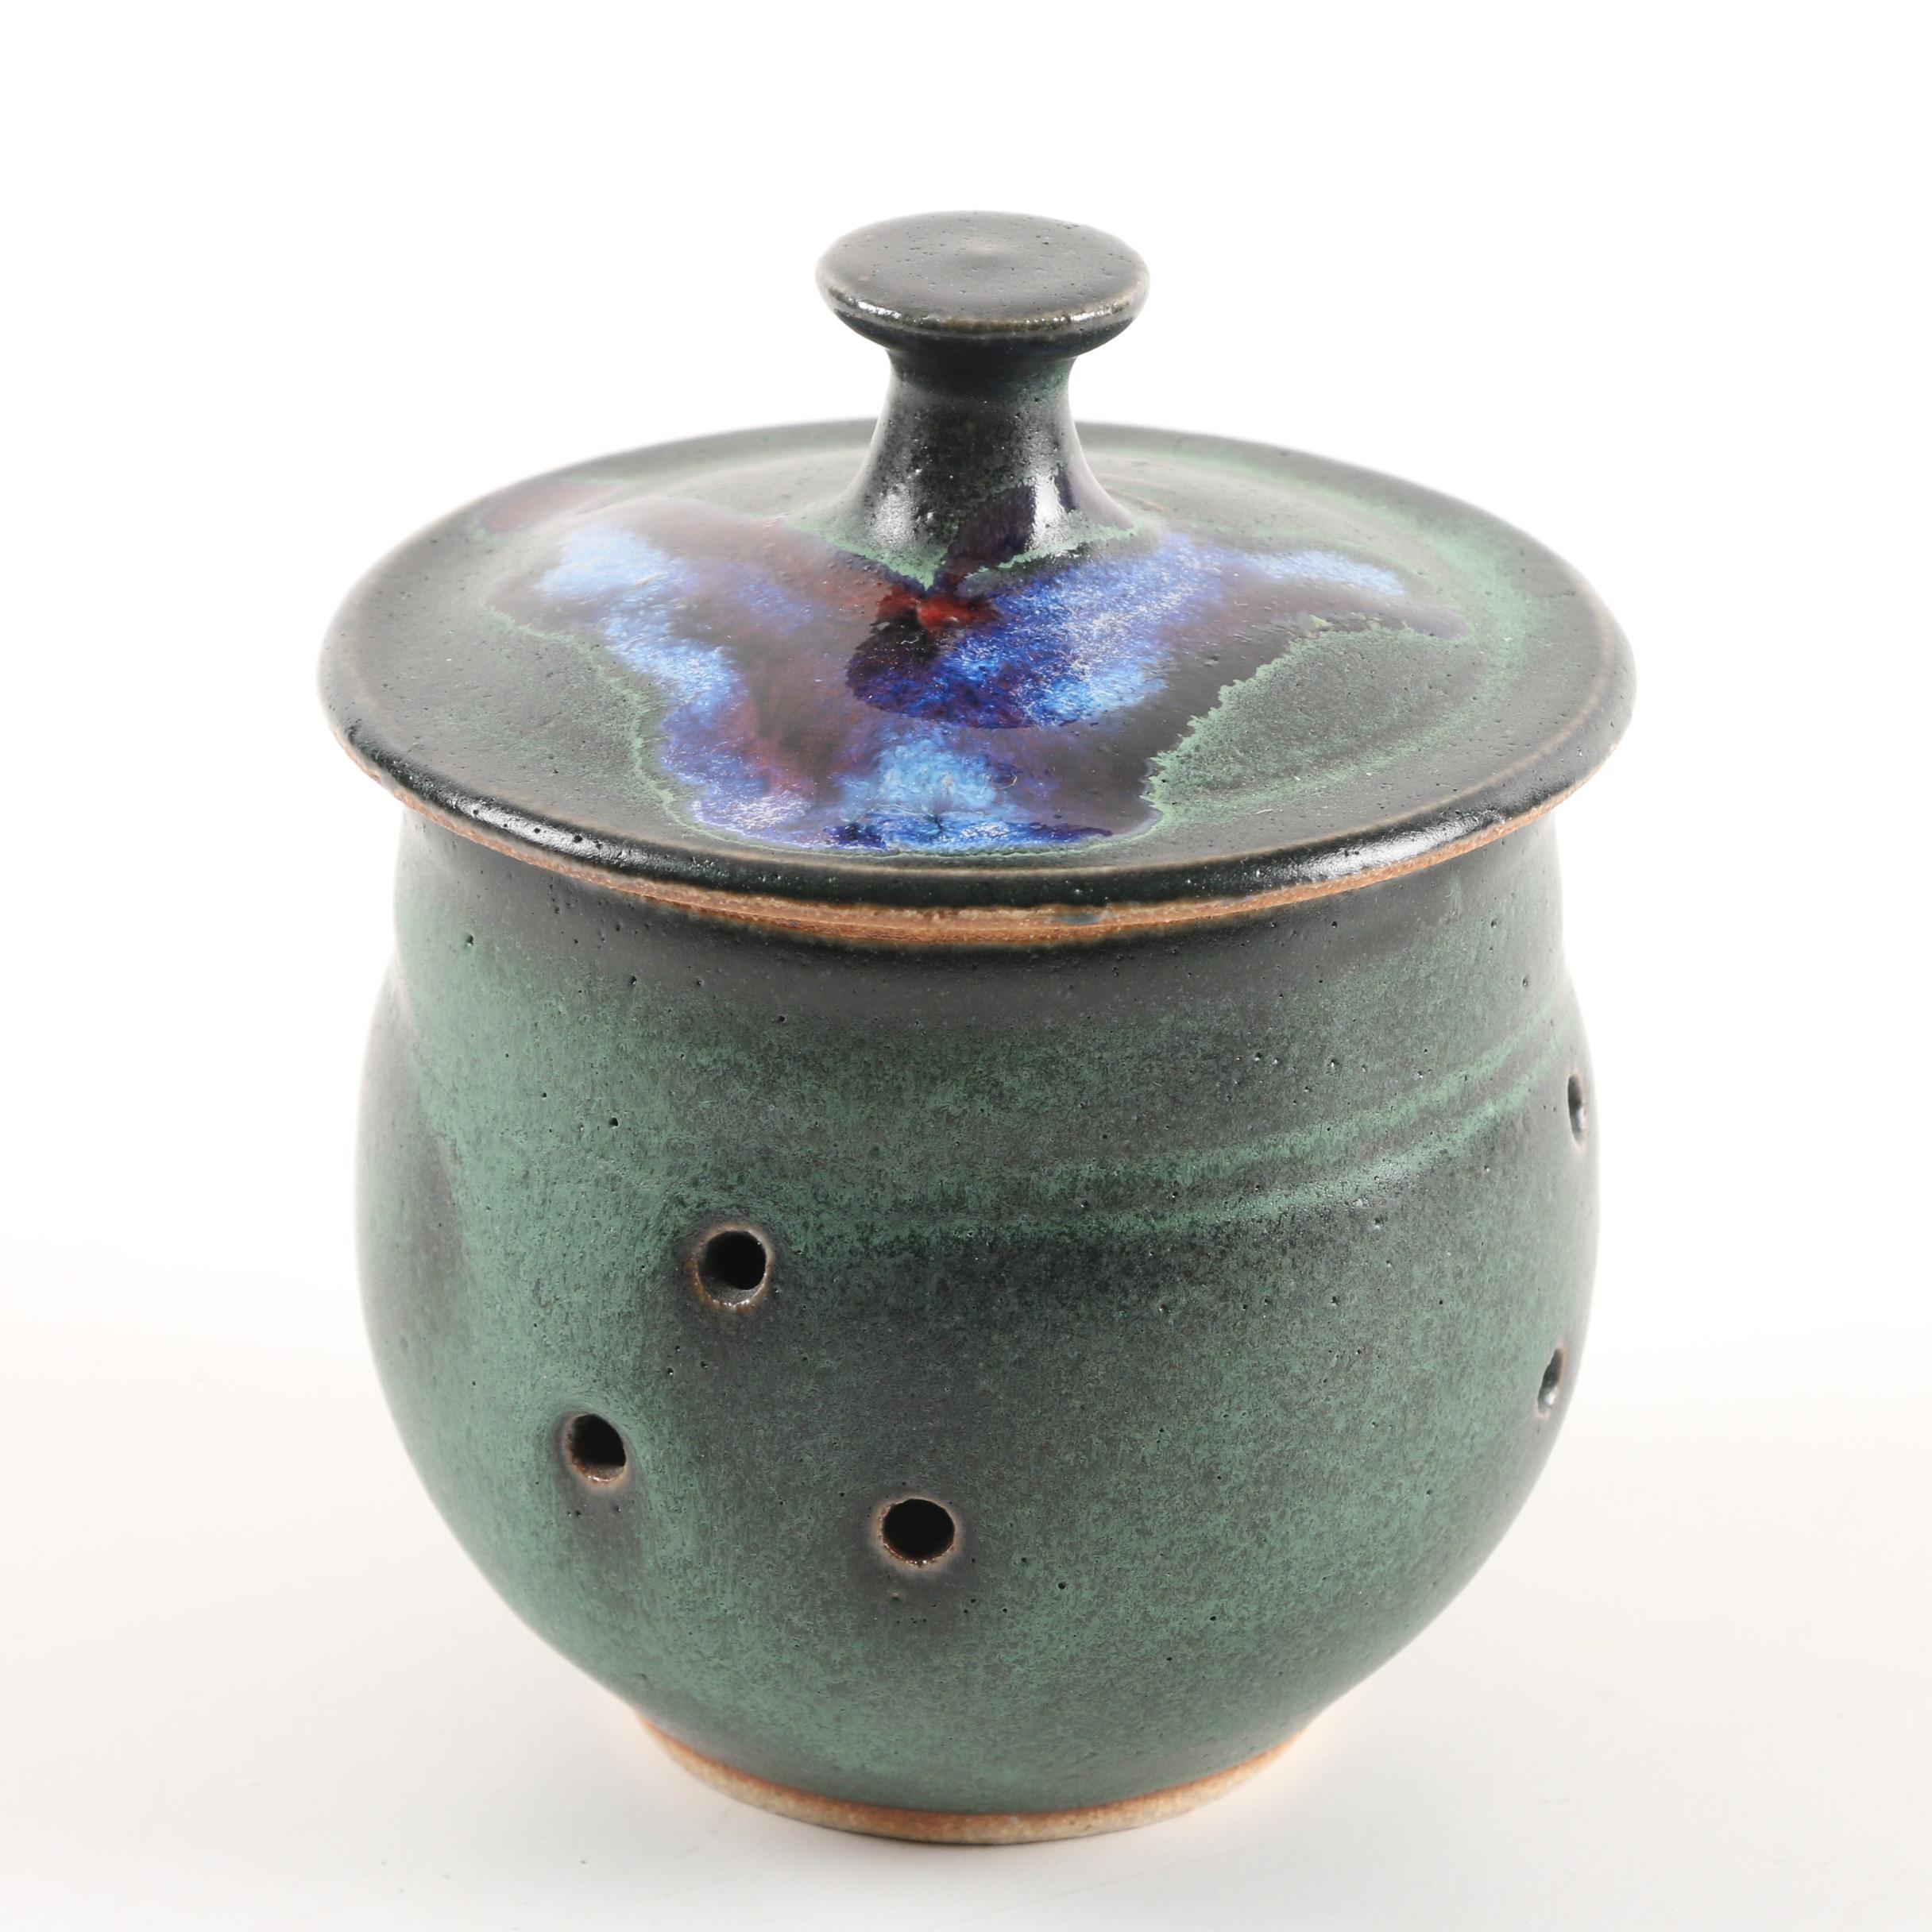 Contemporary Stoneware Garlic Jar